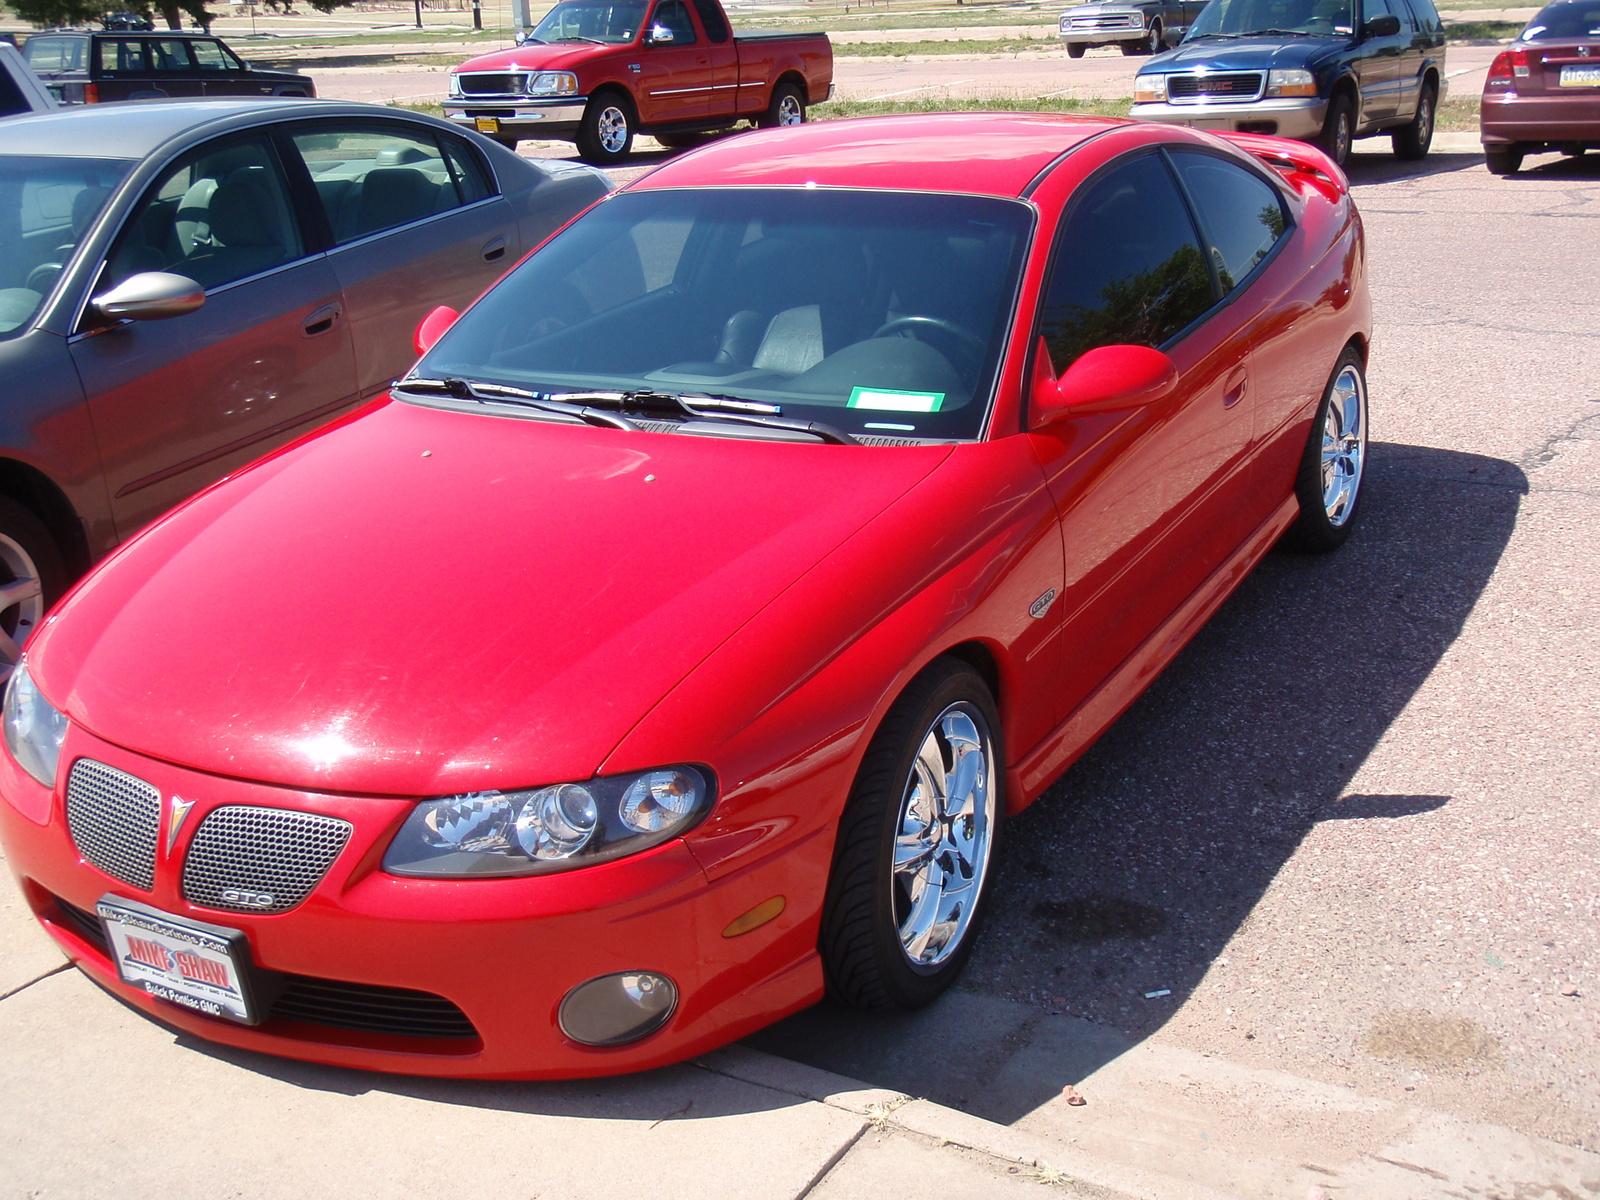 2004 Pontiac GTO - Pictures - 2004 Pontiac GTO Coupe picture ...